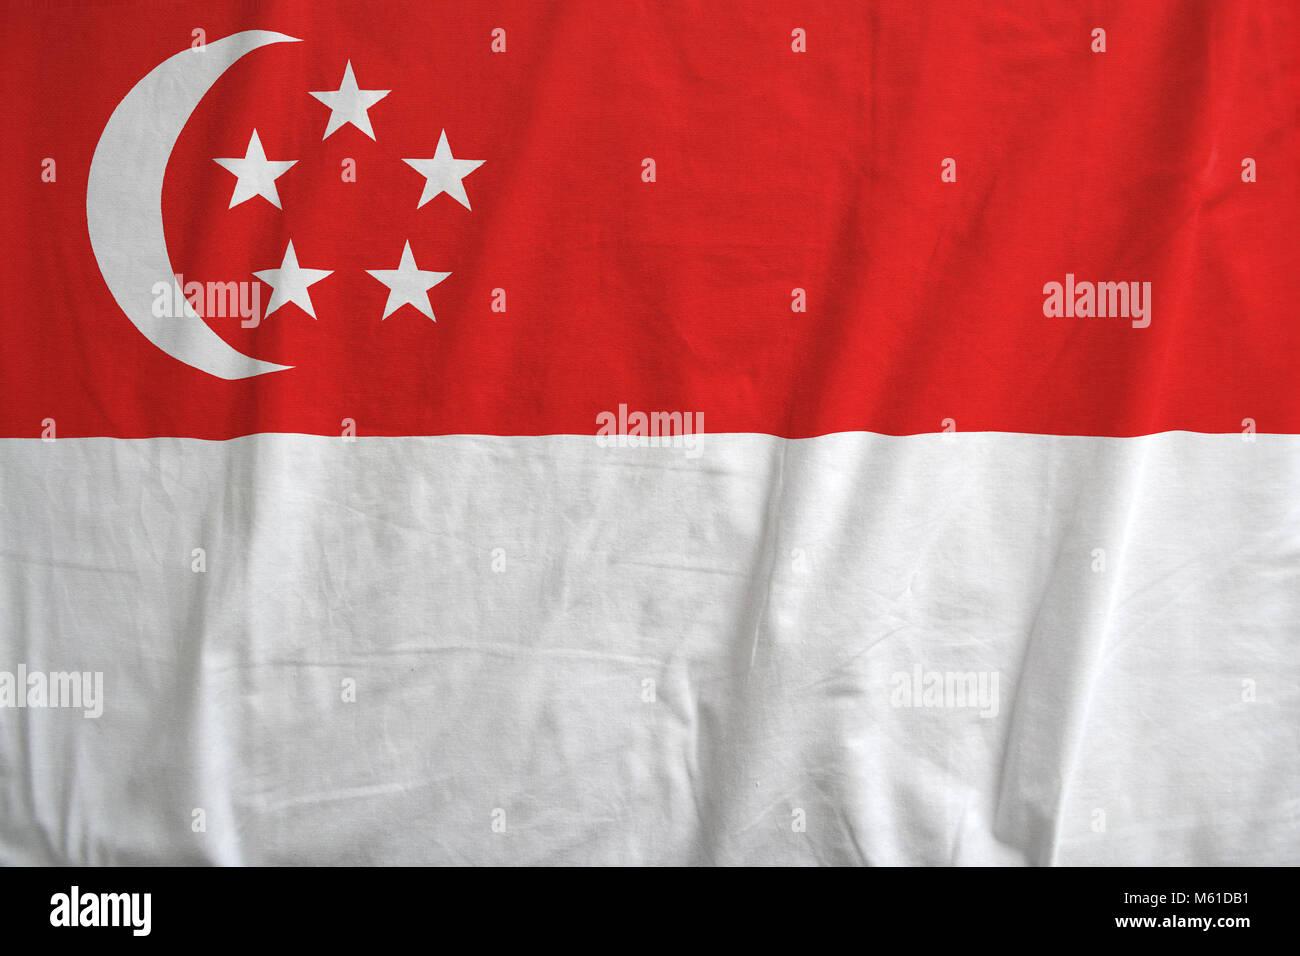 Singapore national flag background texture. - Stock Image